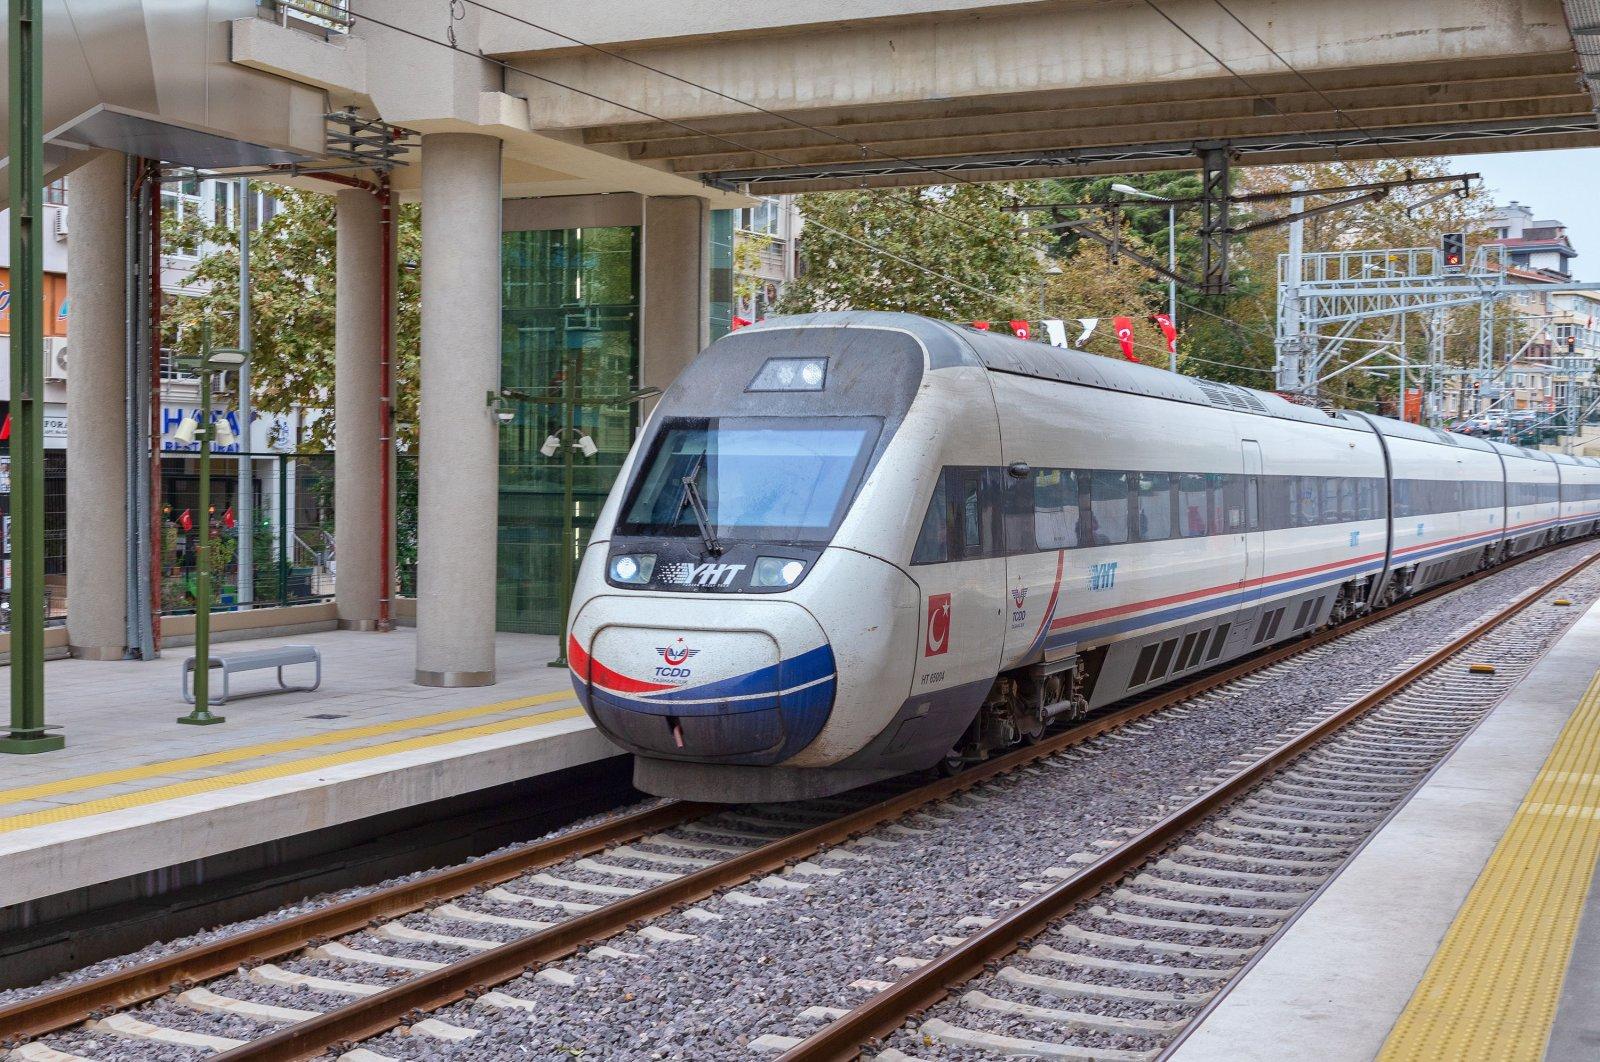 A high-speed train passes through the Bostancı neighborhood, Istanbul, Turkey, Oct. 31, 2019. (Shutterstock Photo)